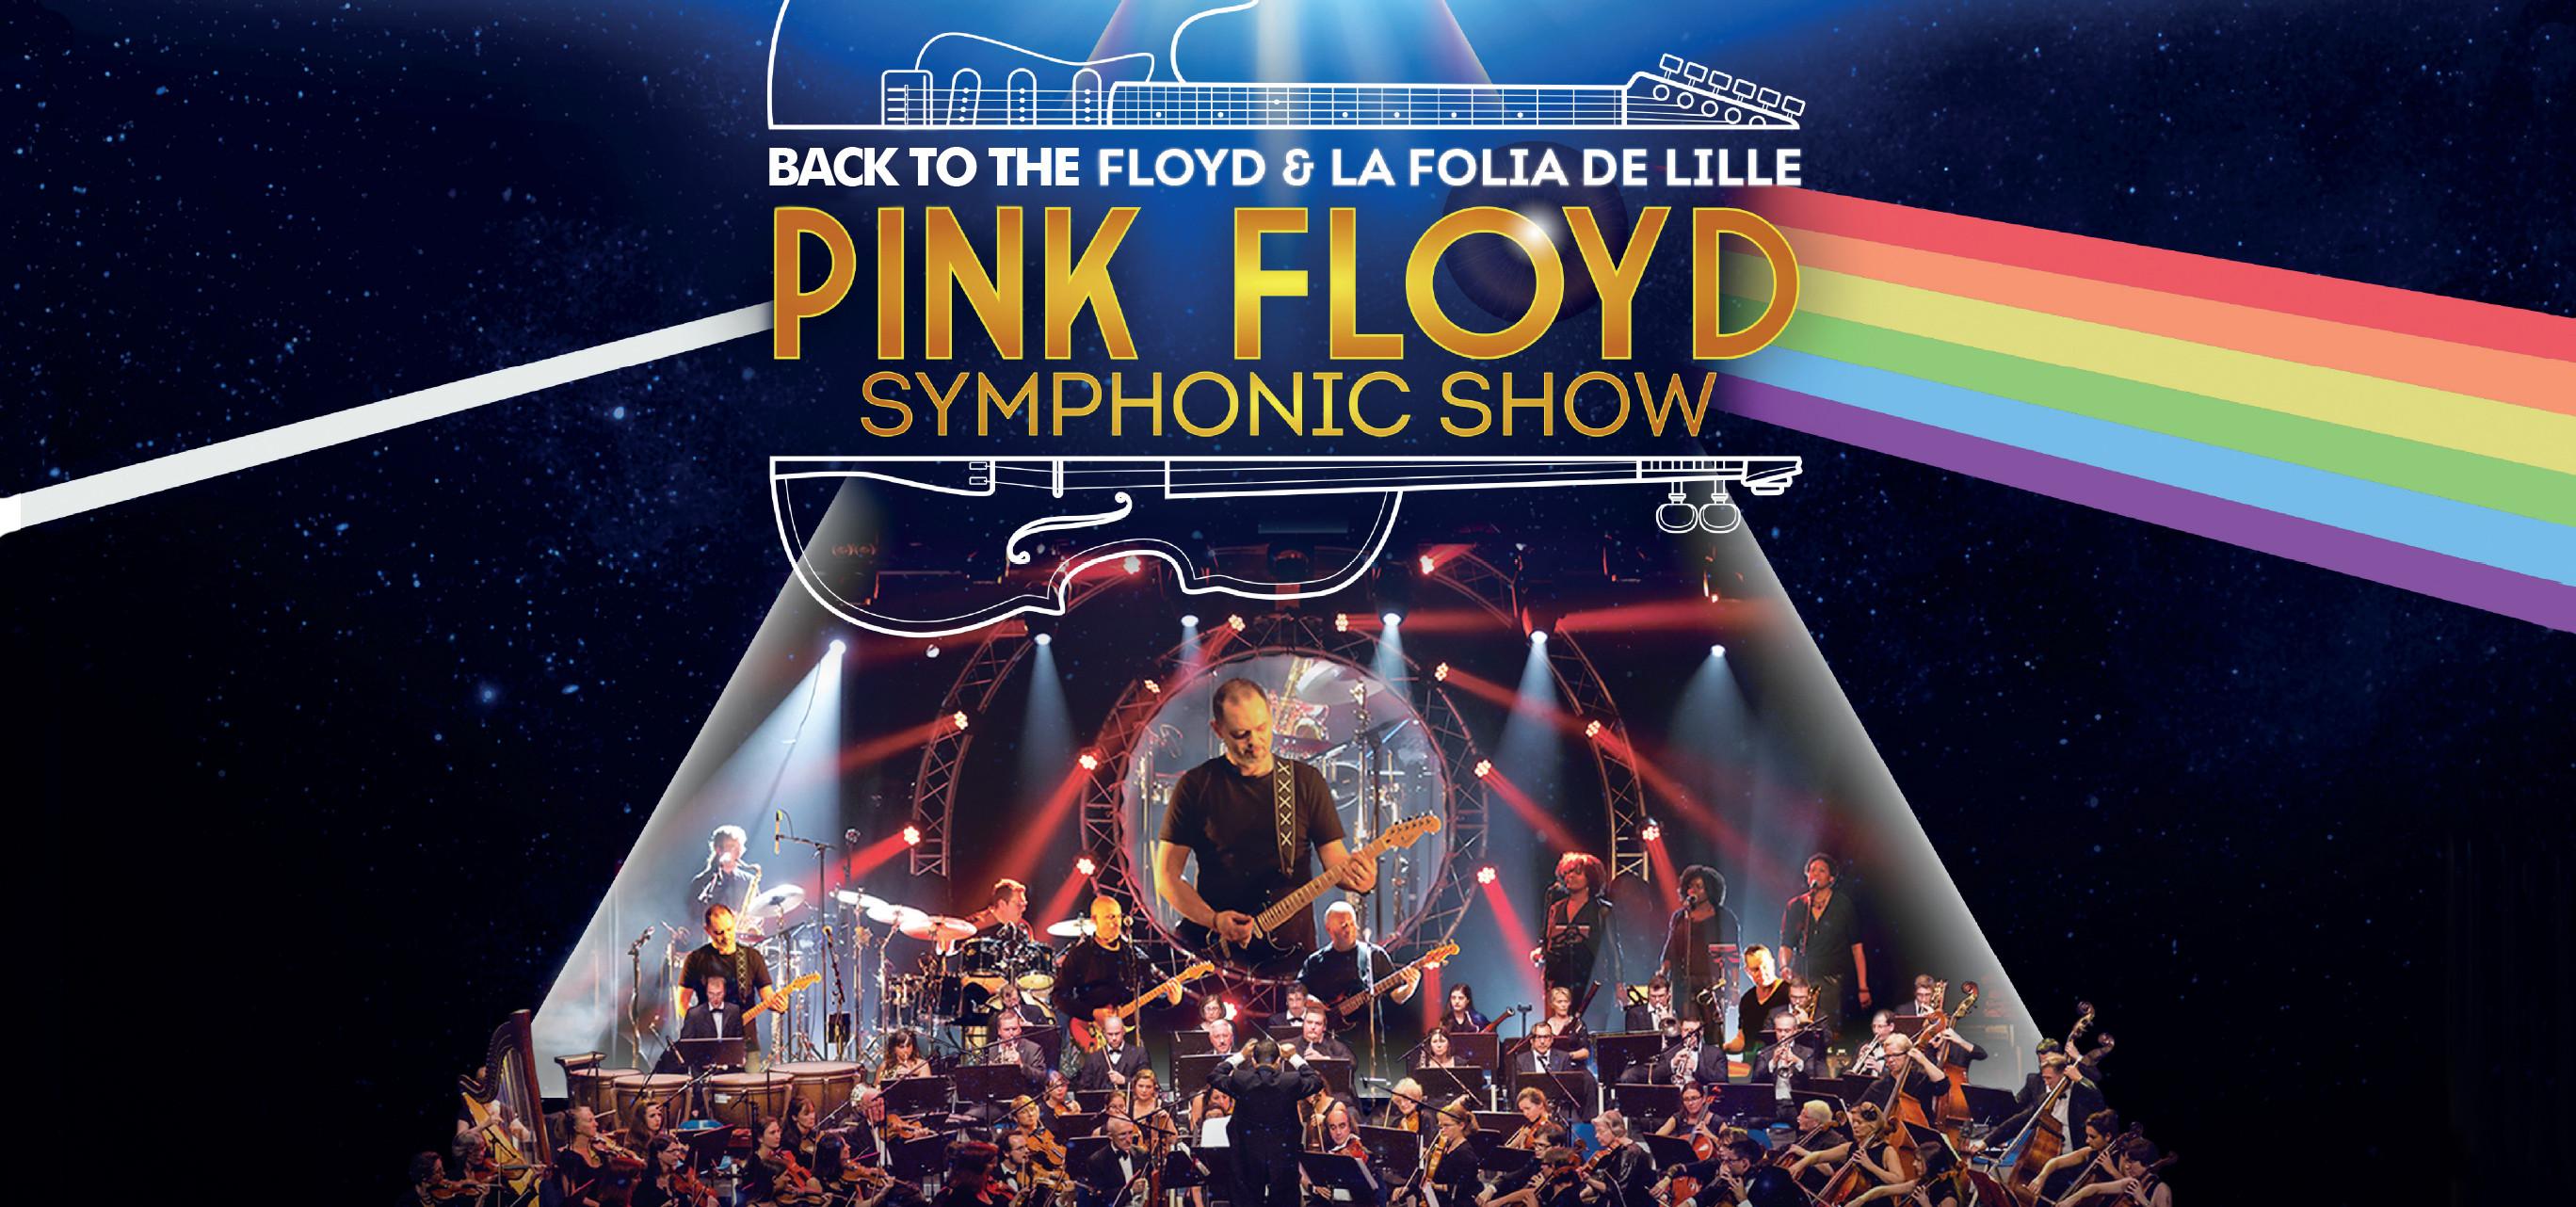 PINK FLOYD SYMPHONIC SHOW